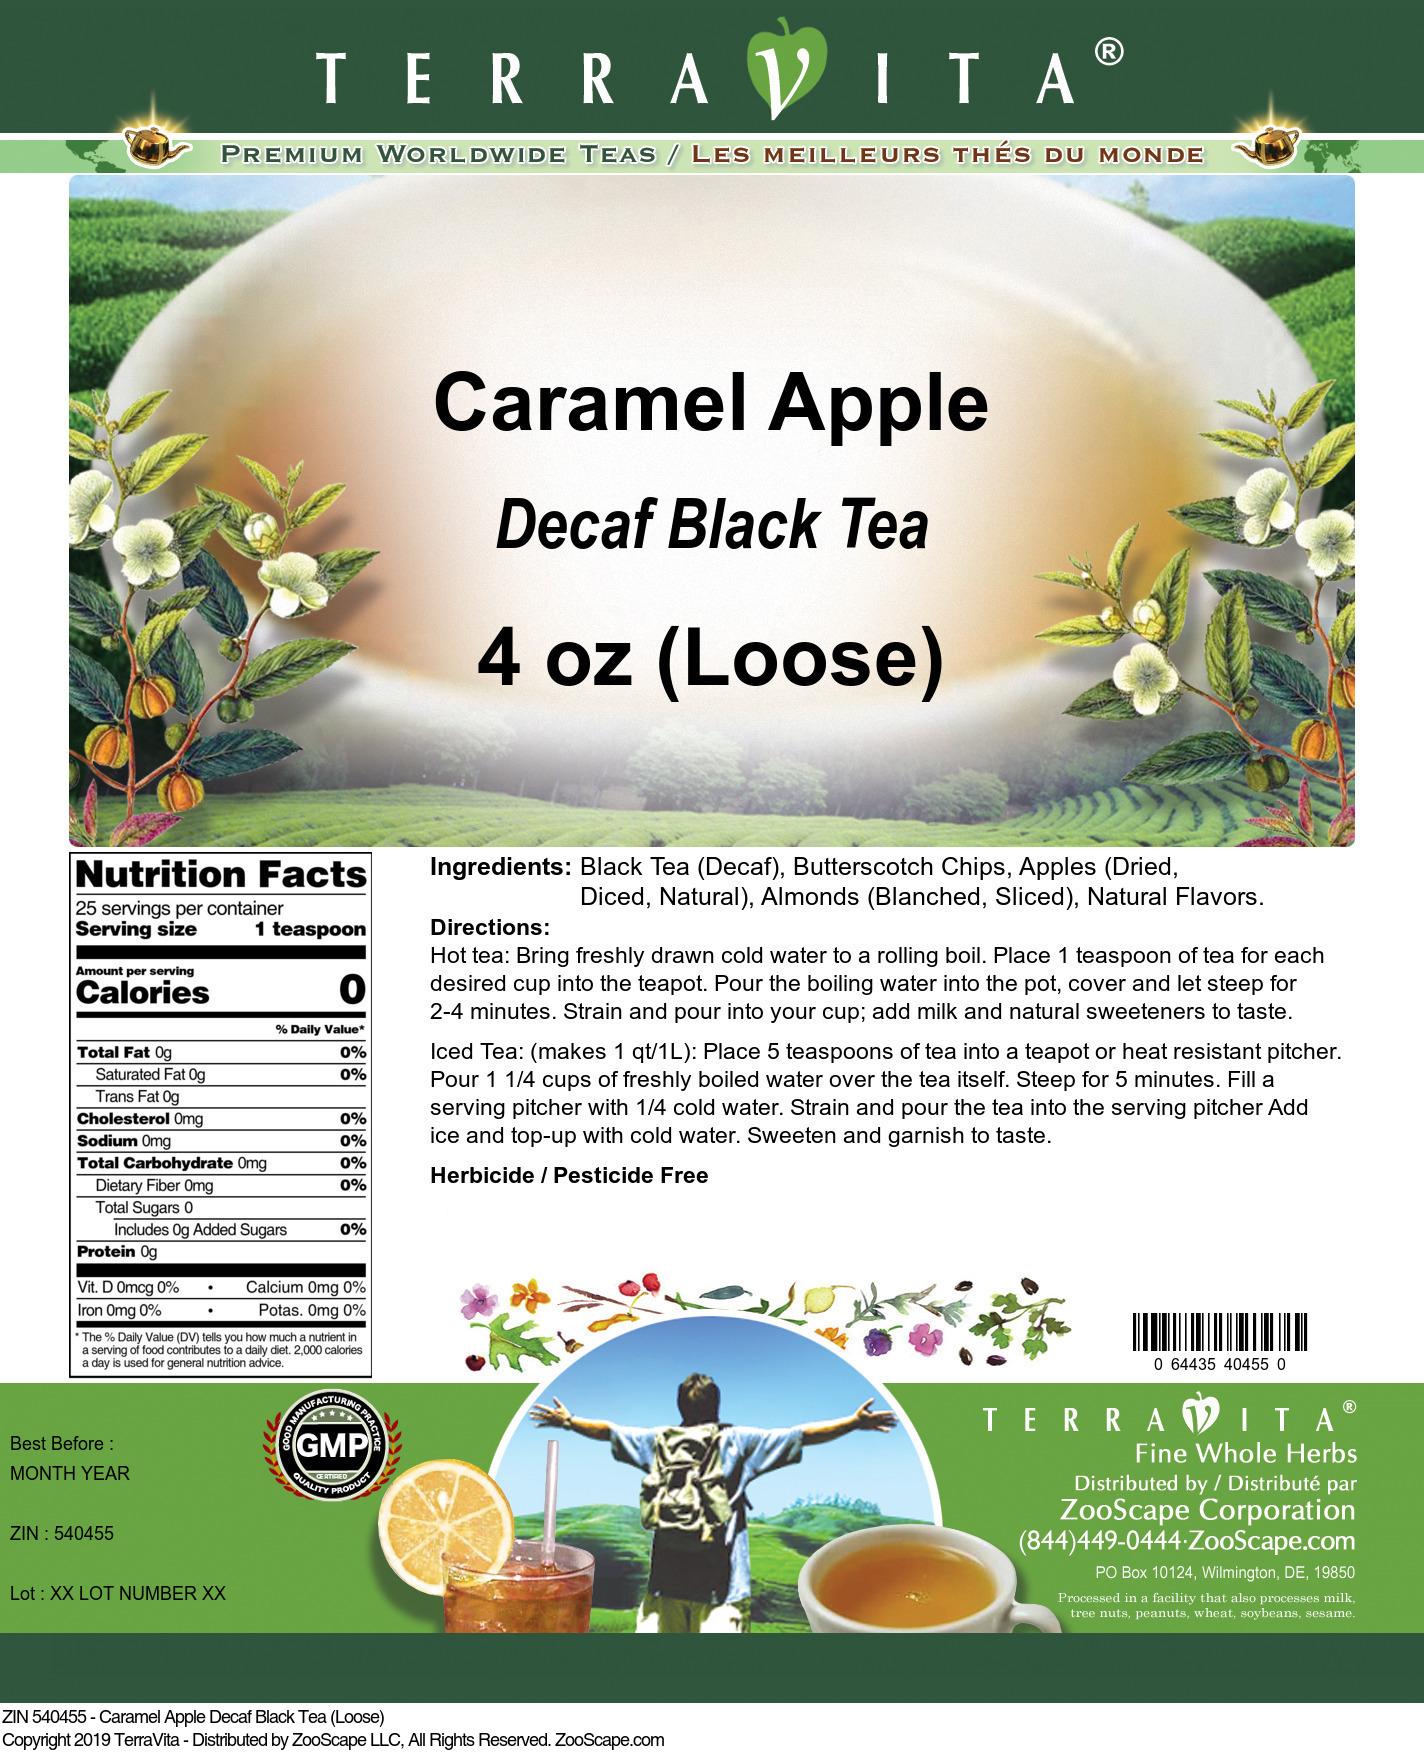 Caramel Apple Decaf Black Tea (Loose)